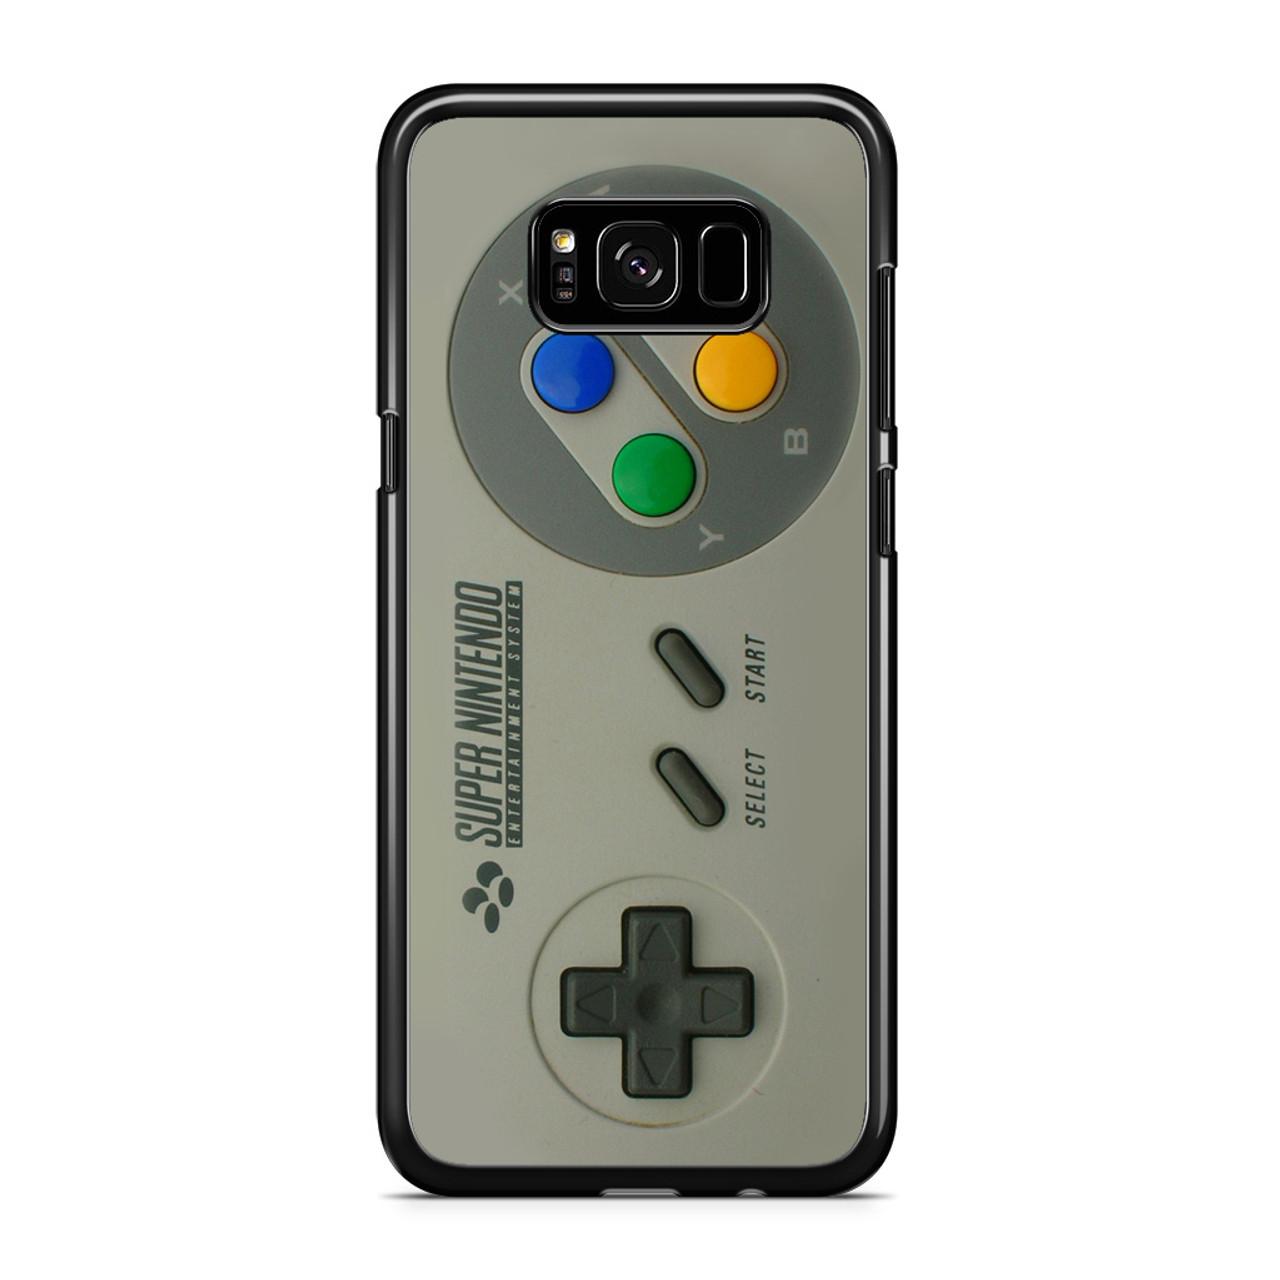 designer fashion 4664c cfc0d SNES Controller Samsung Galaxy S8 Case